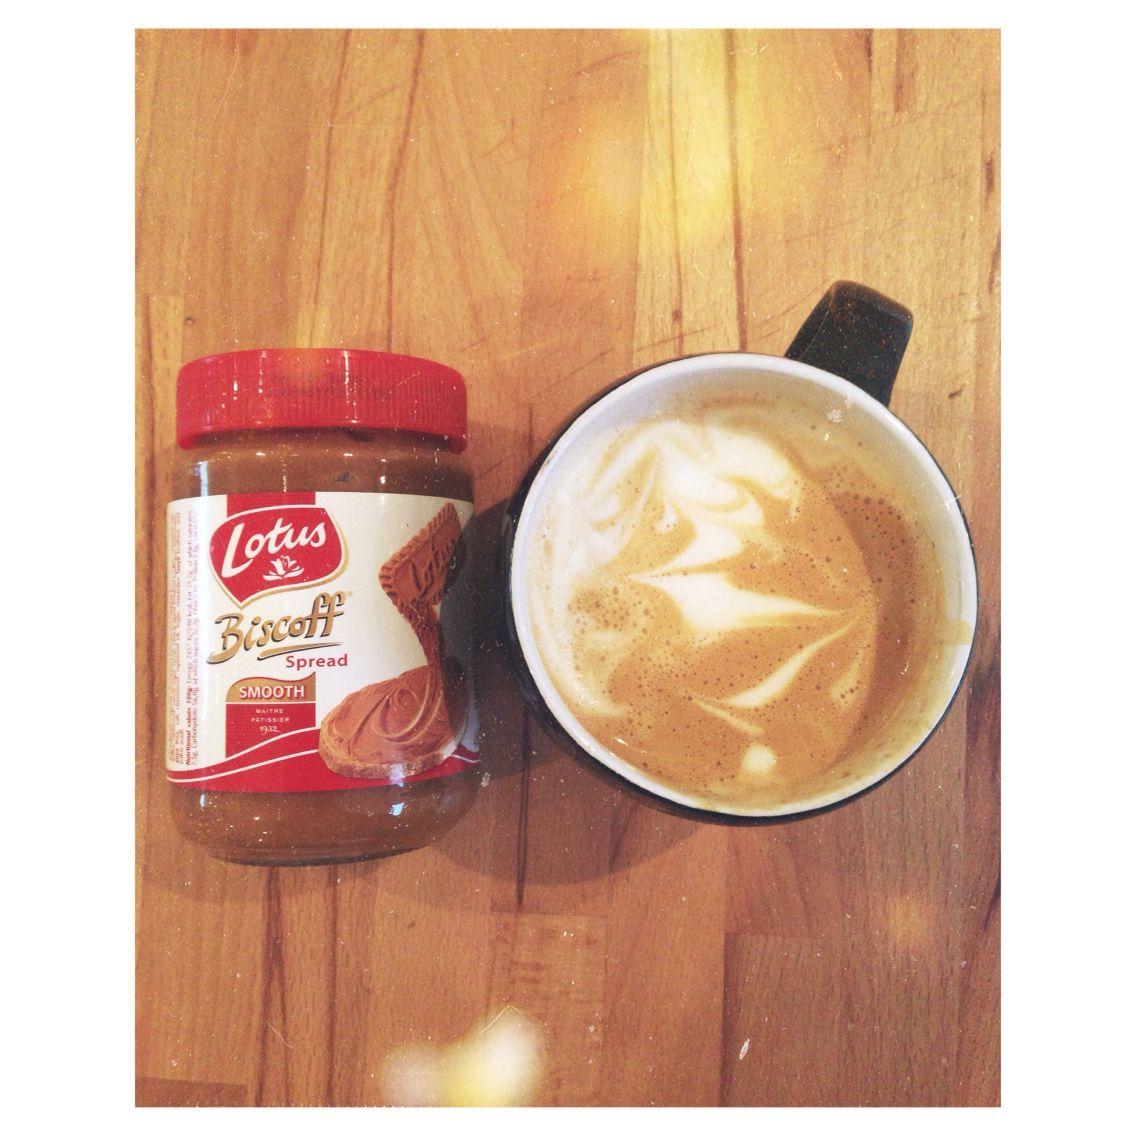 Biscoffee